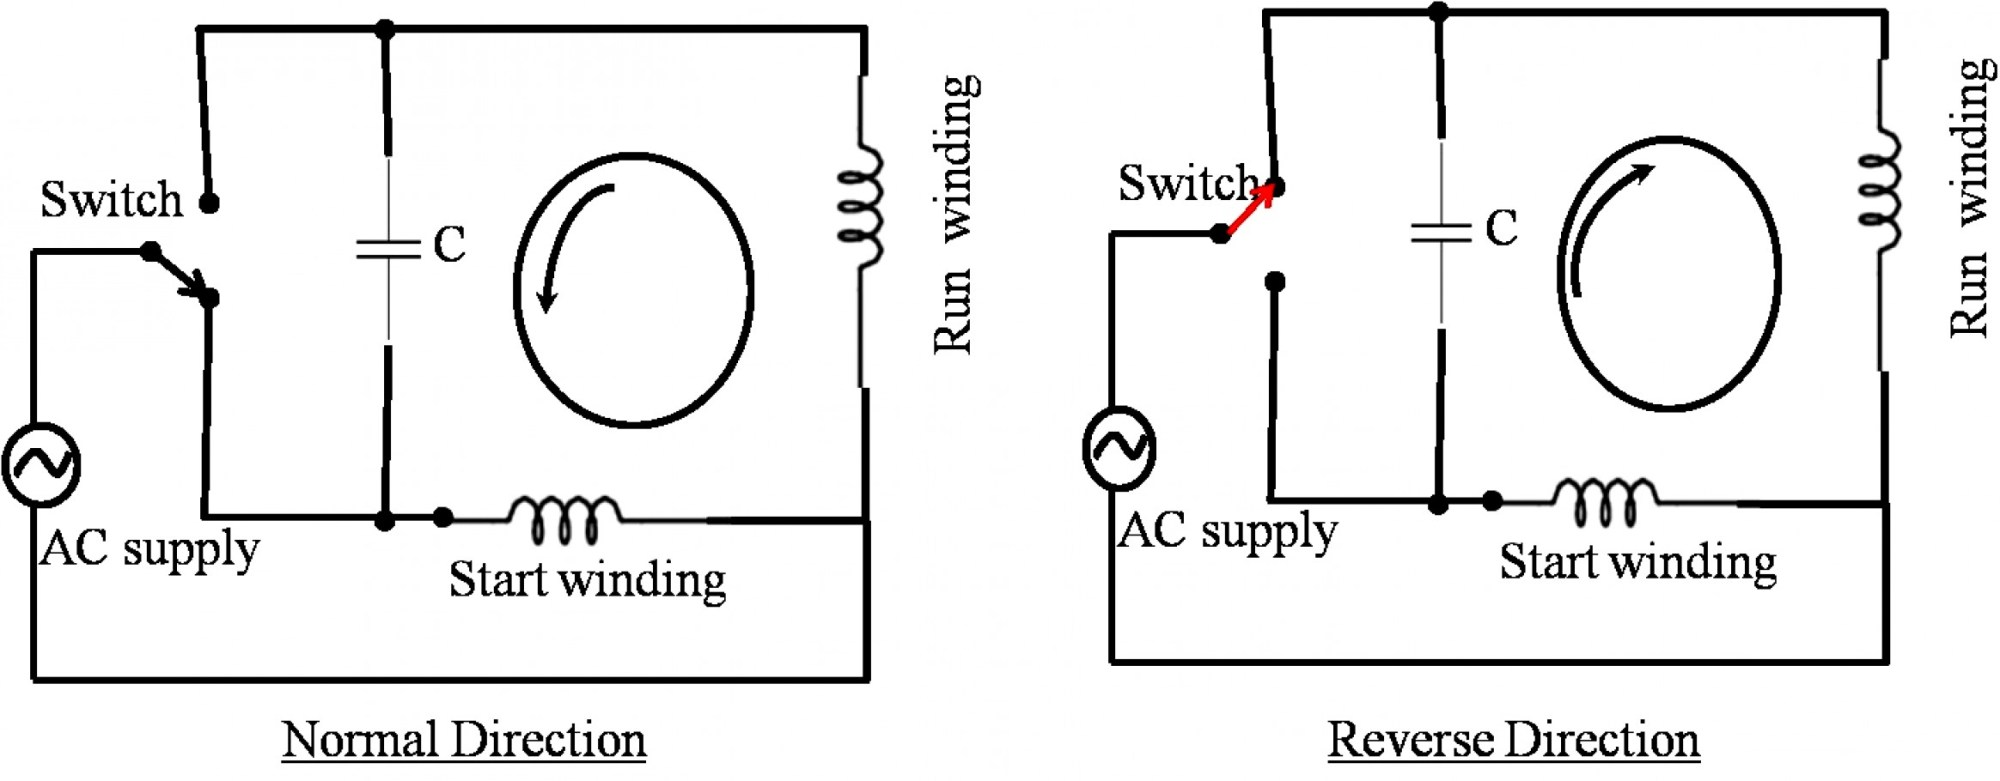 hight resolution of phase motor wiring diagrams century besides 220 vac single phase10 pole motor wiring diagram schema wiring